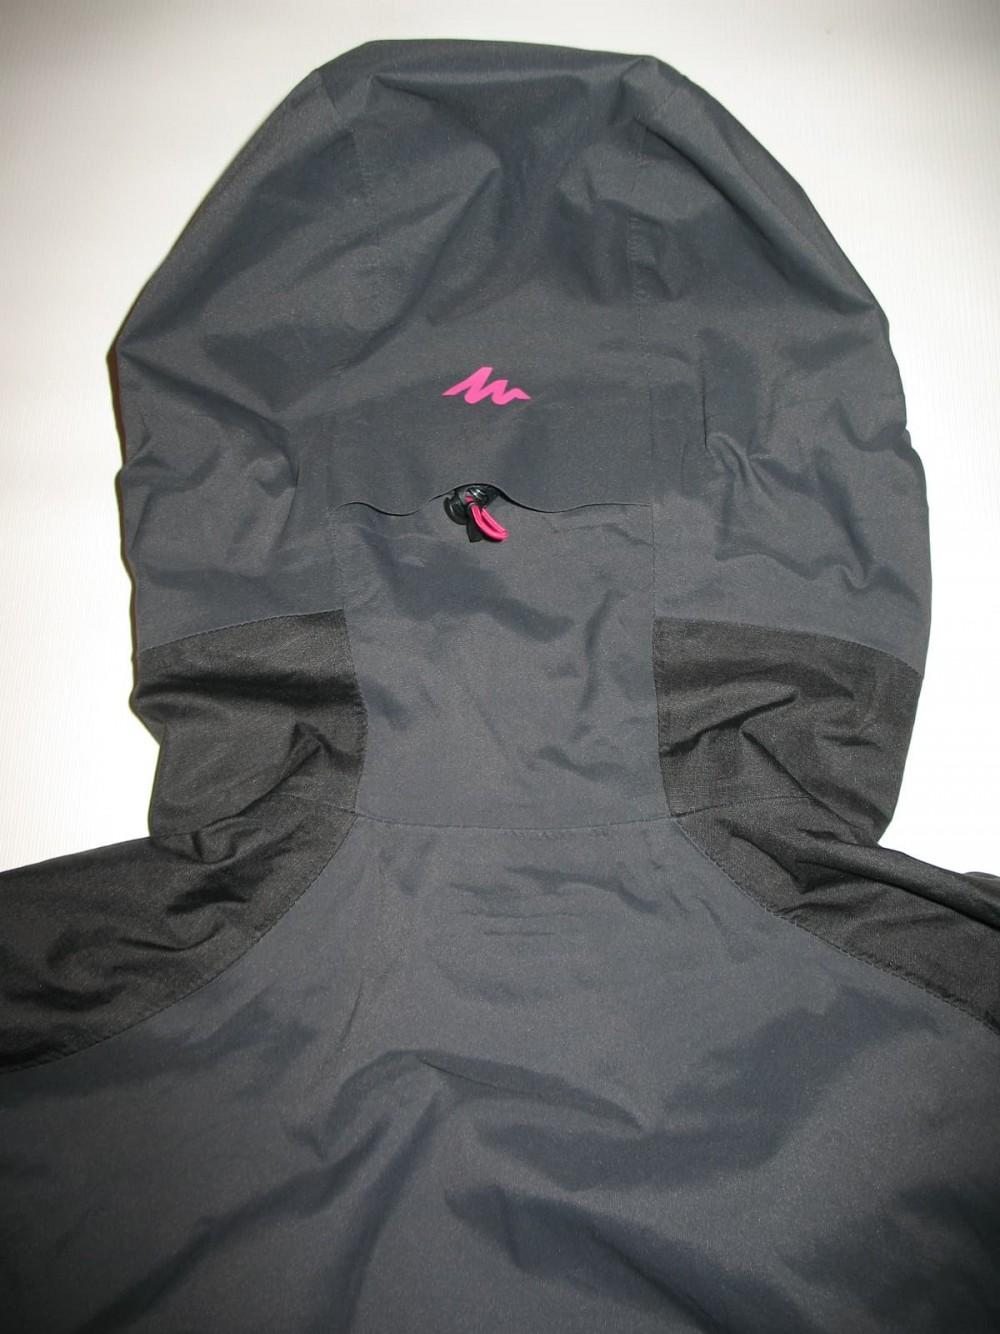 Куртка QUECHUA forclaz 900 l jacket lady (размер XS/S) - 9